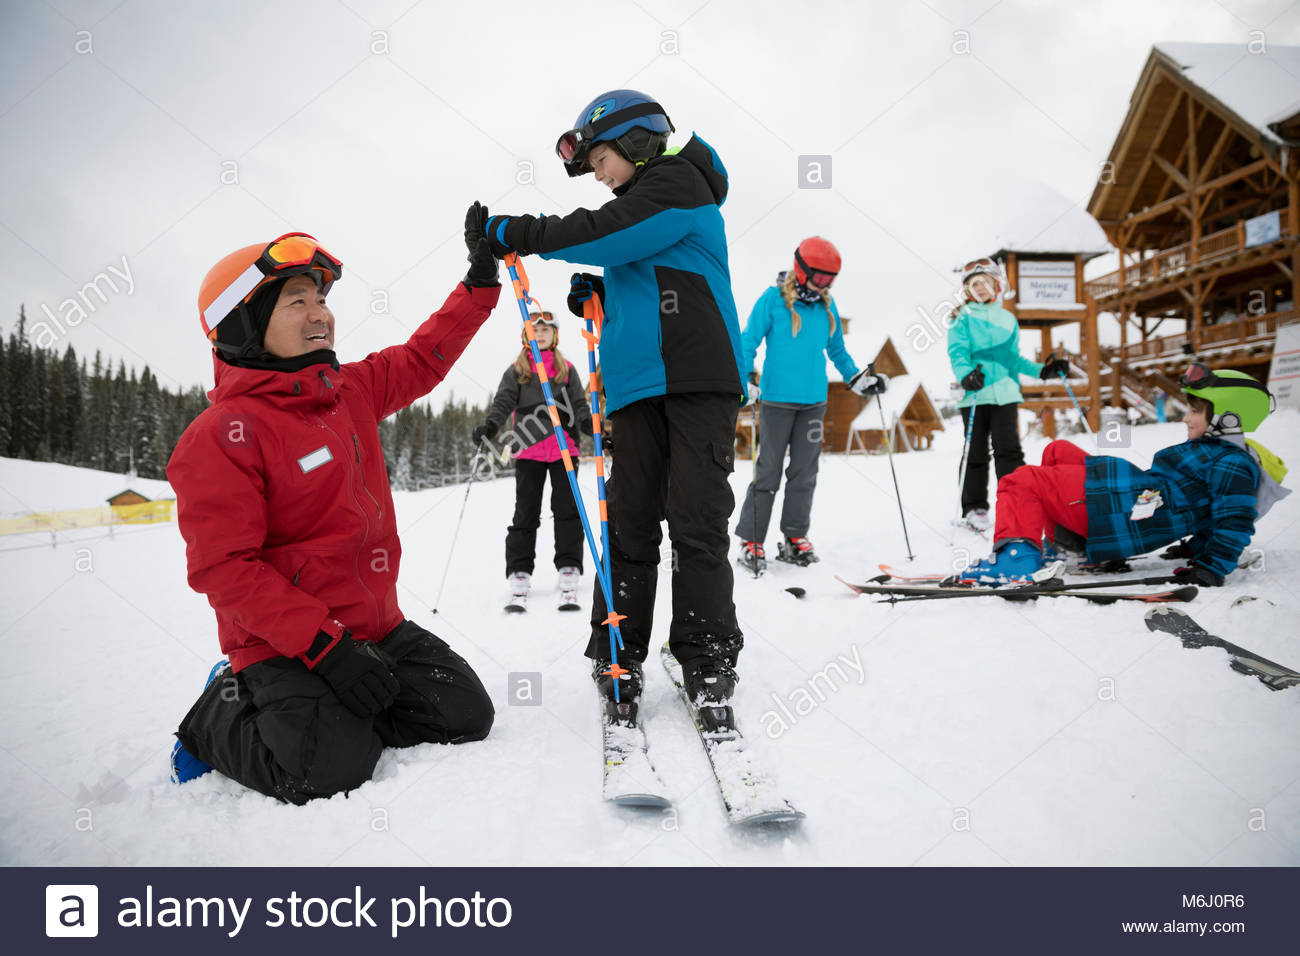 Ski instructor and boy high-fiving during ski lesson at ski resort - Stock Image